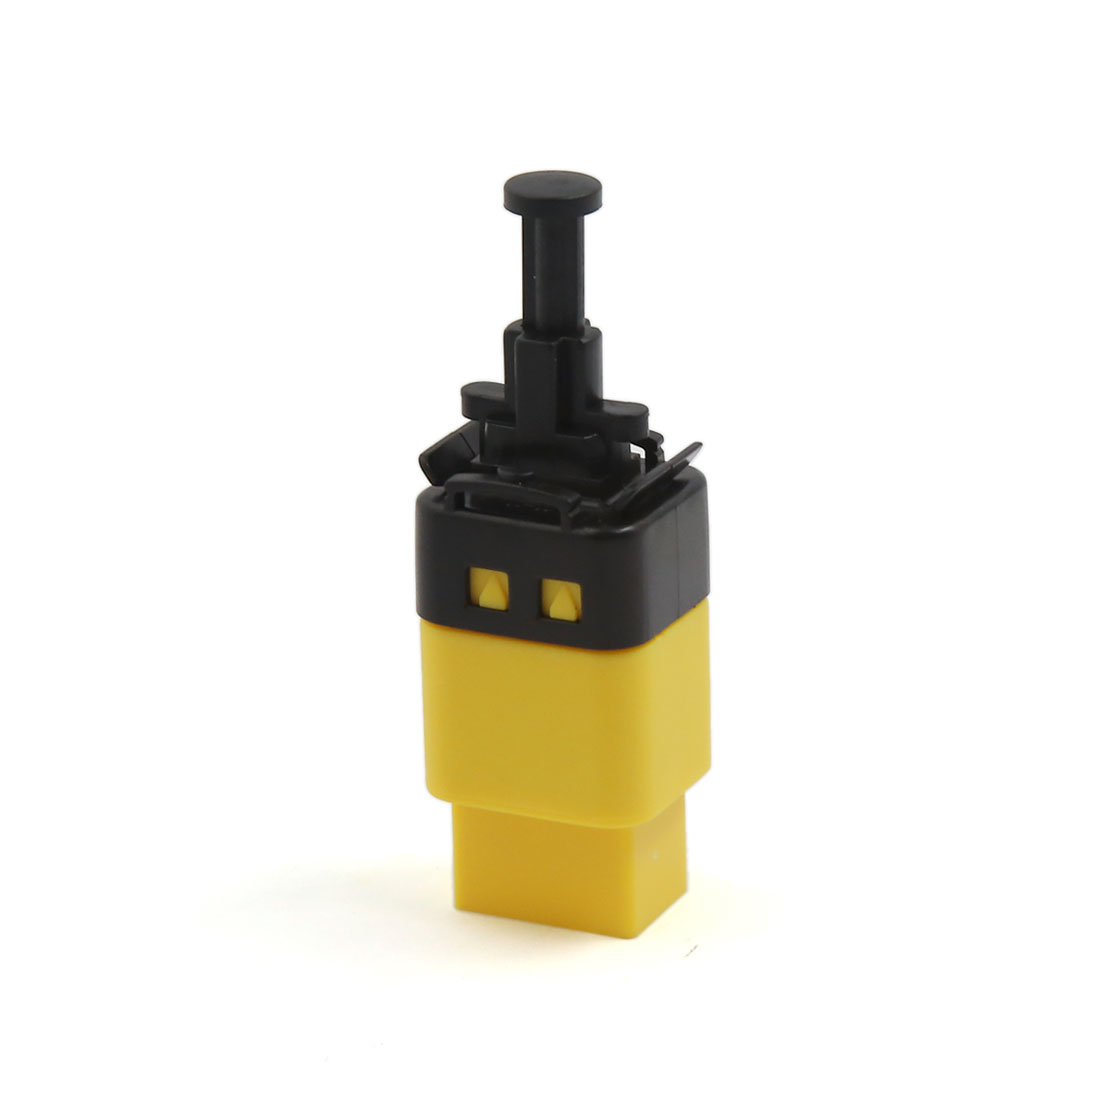 Automatic Car Brake Light Switch for 2005-2008 Chevrolet Aveo 2004-2007 Optra Neu